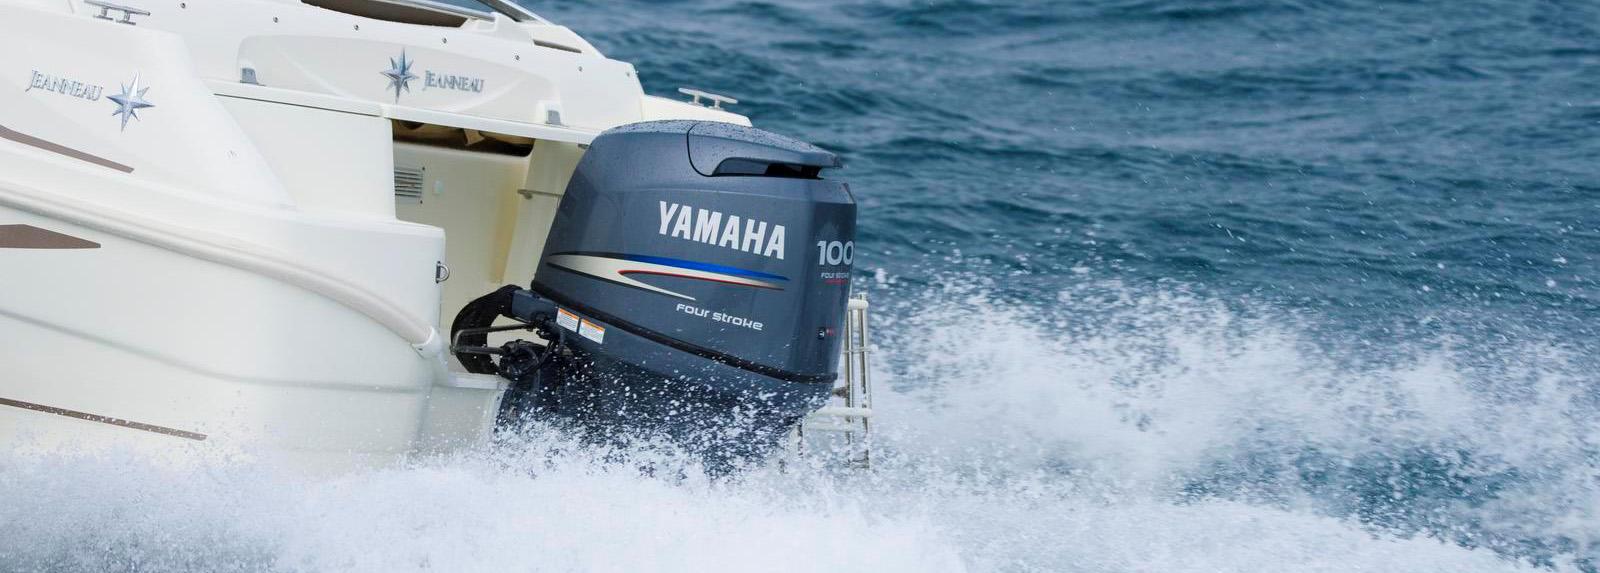 правила обкатки нового лодочного мотора